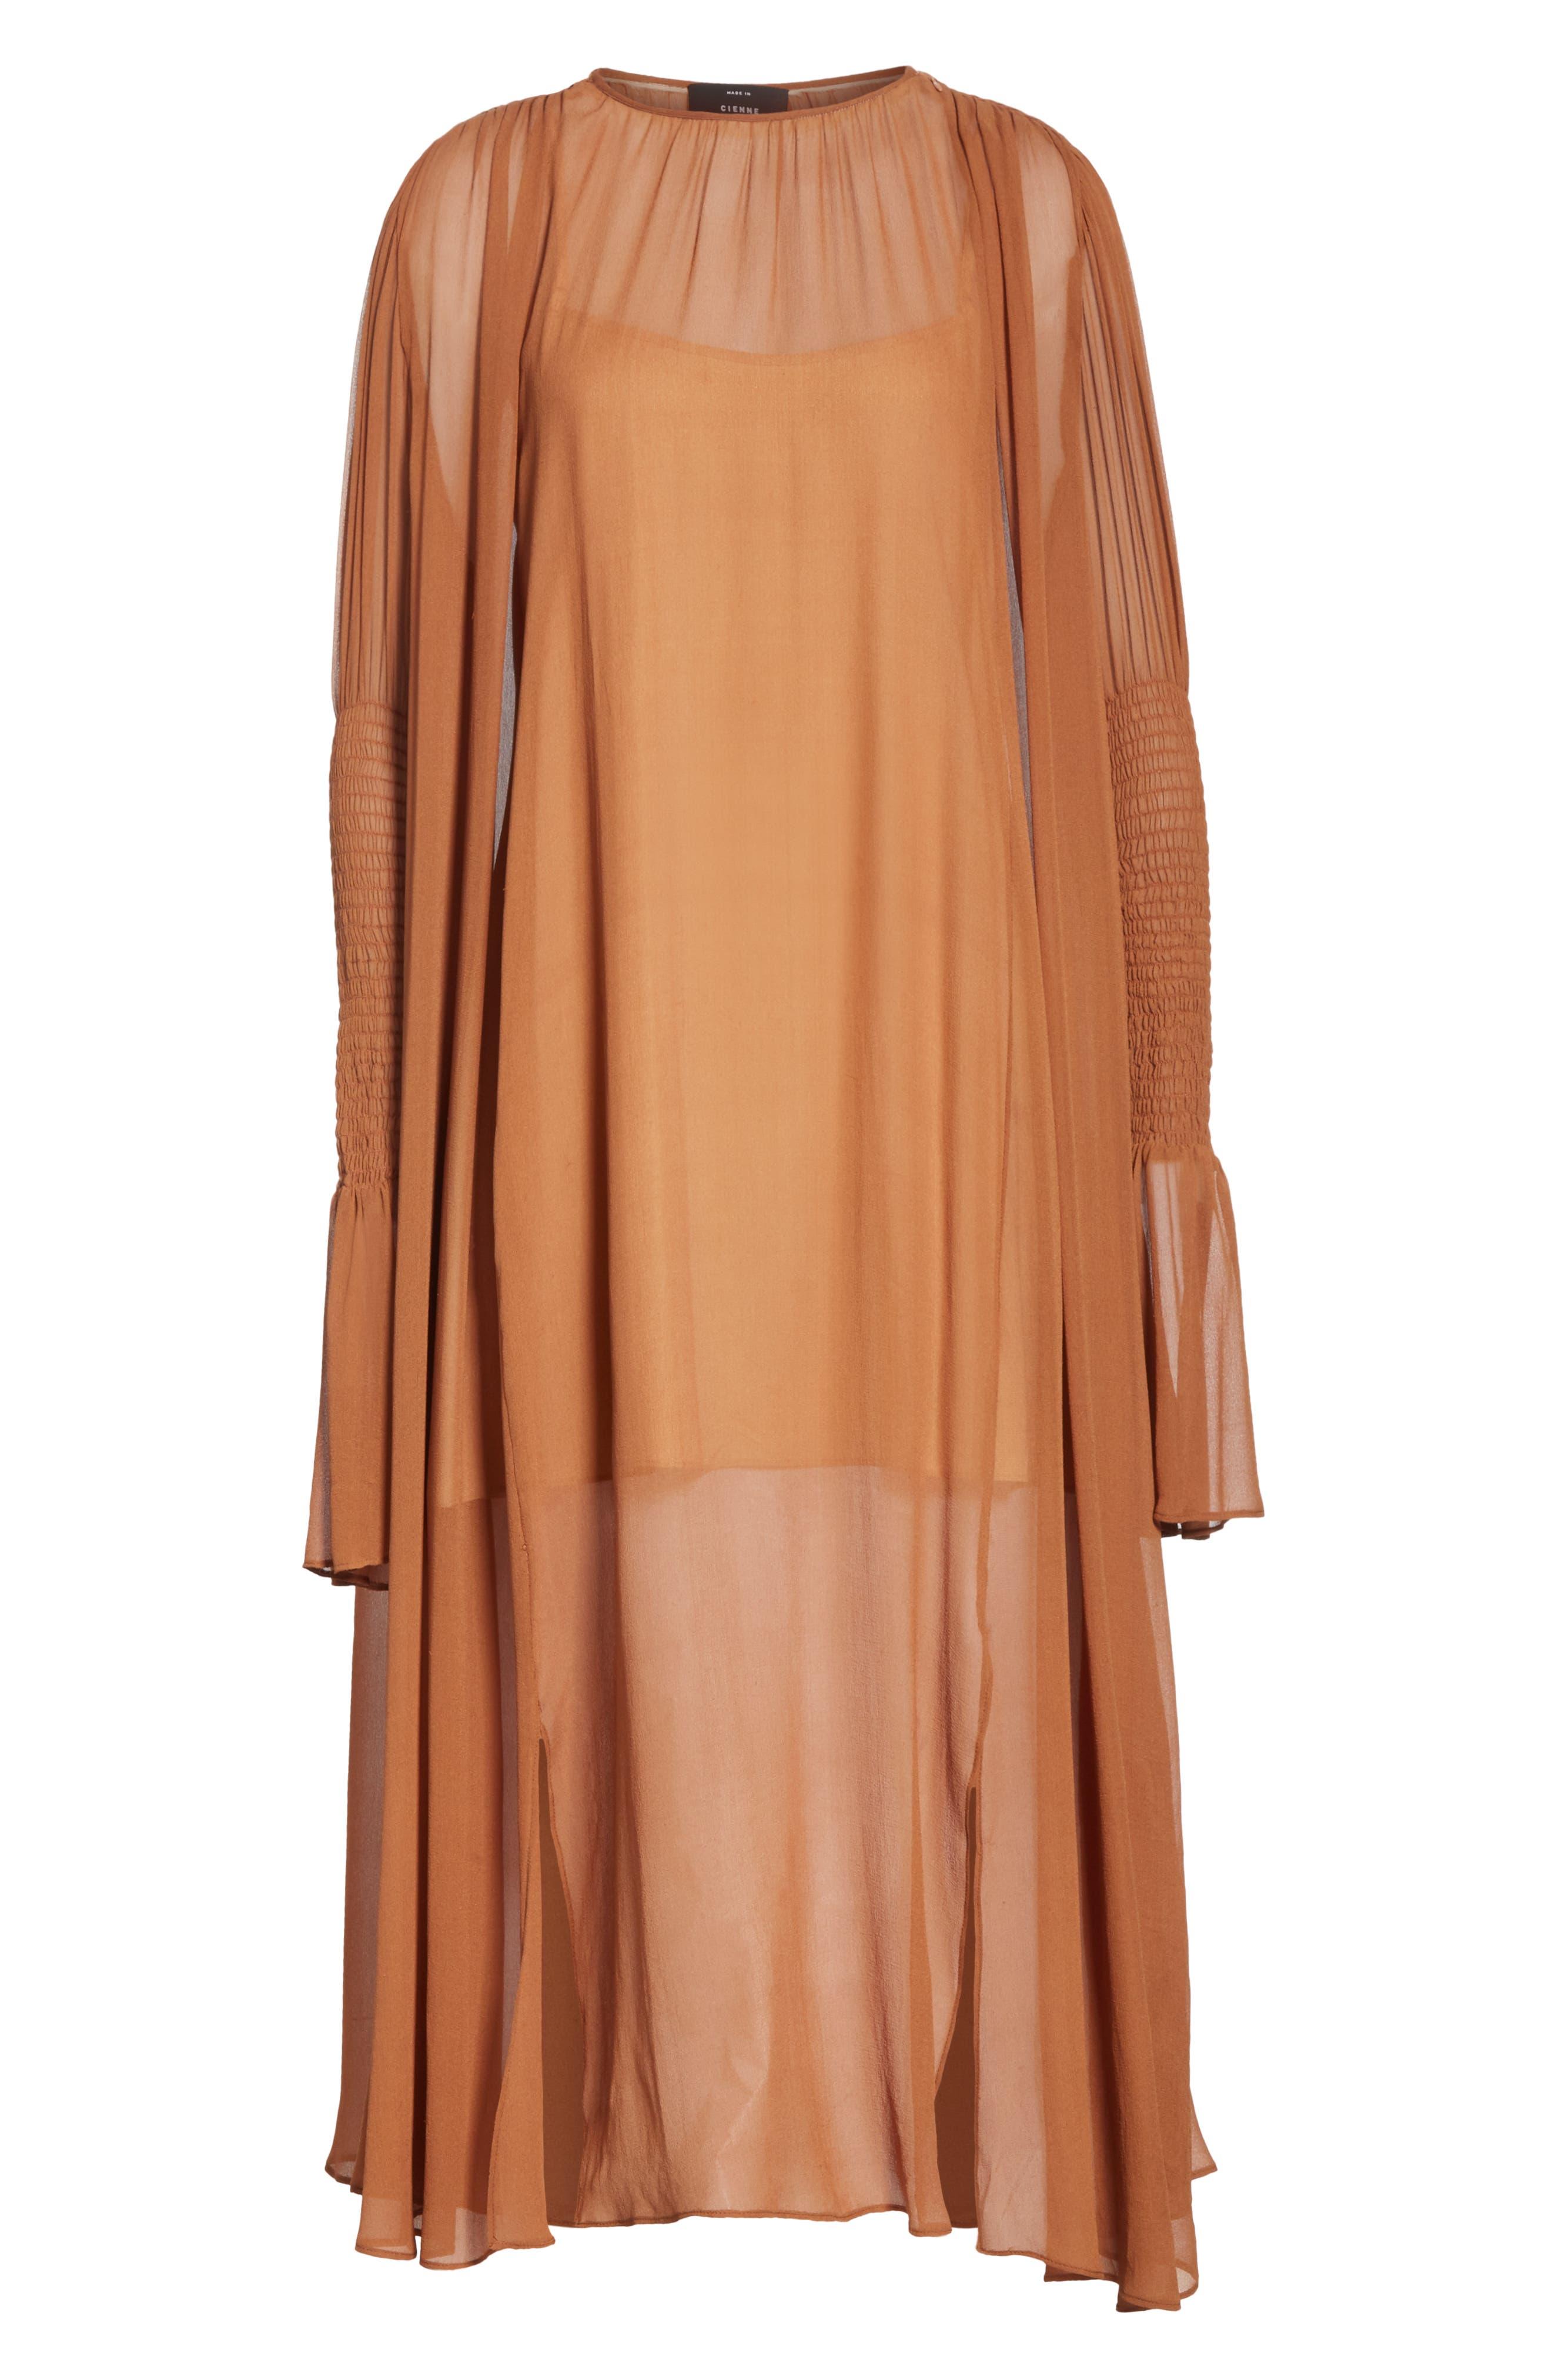 CIENNE,                             The Costa Silk Dress,                             Alternate thumbnail 6, color,                             200